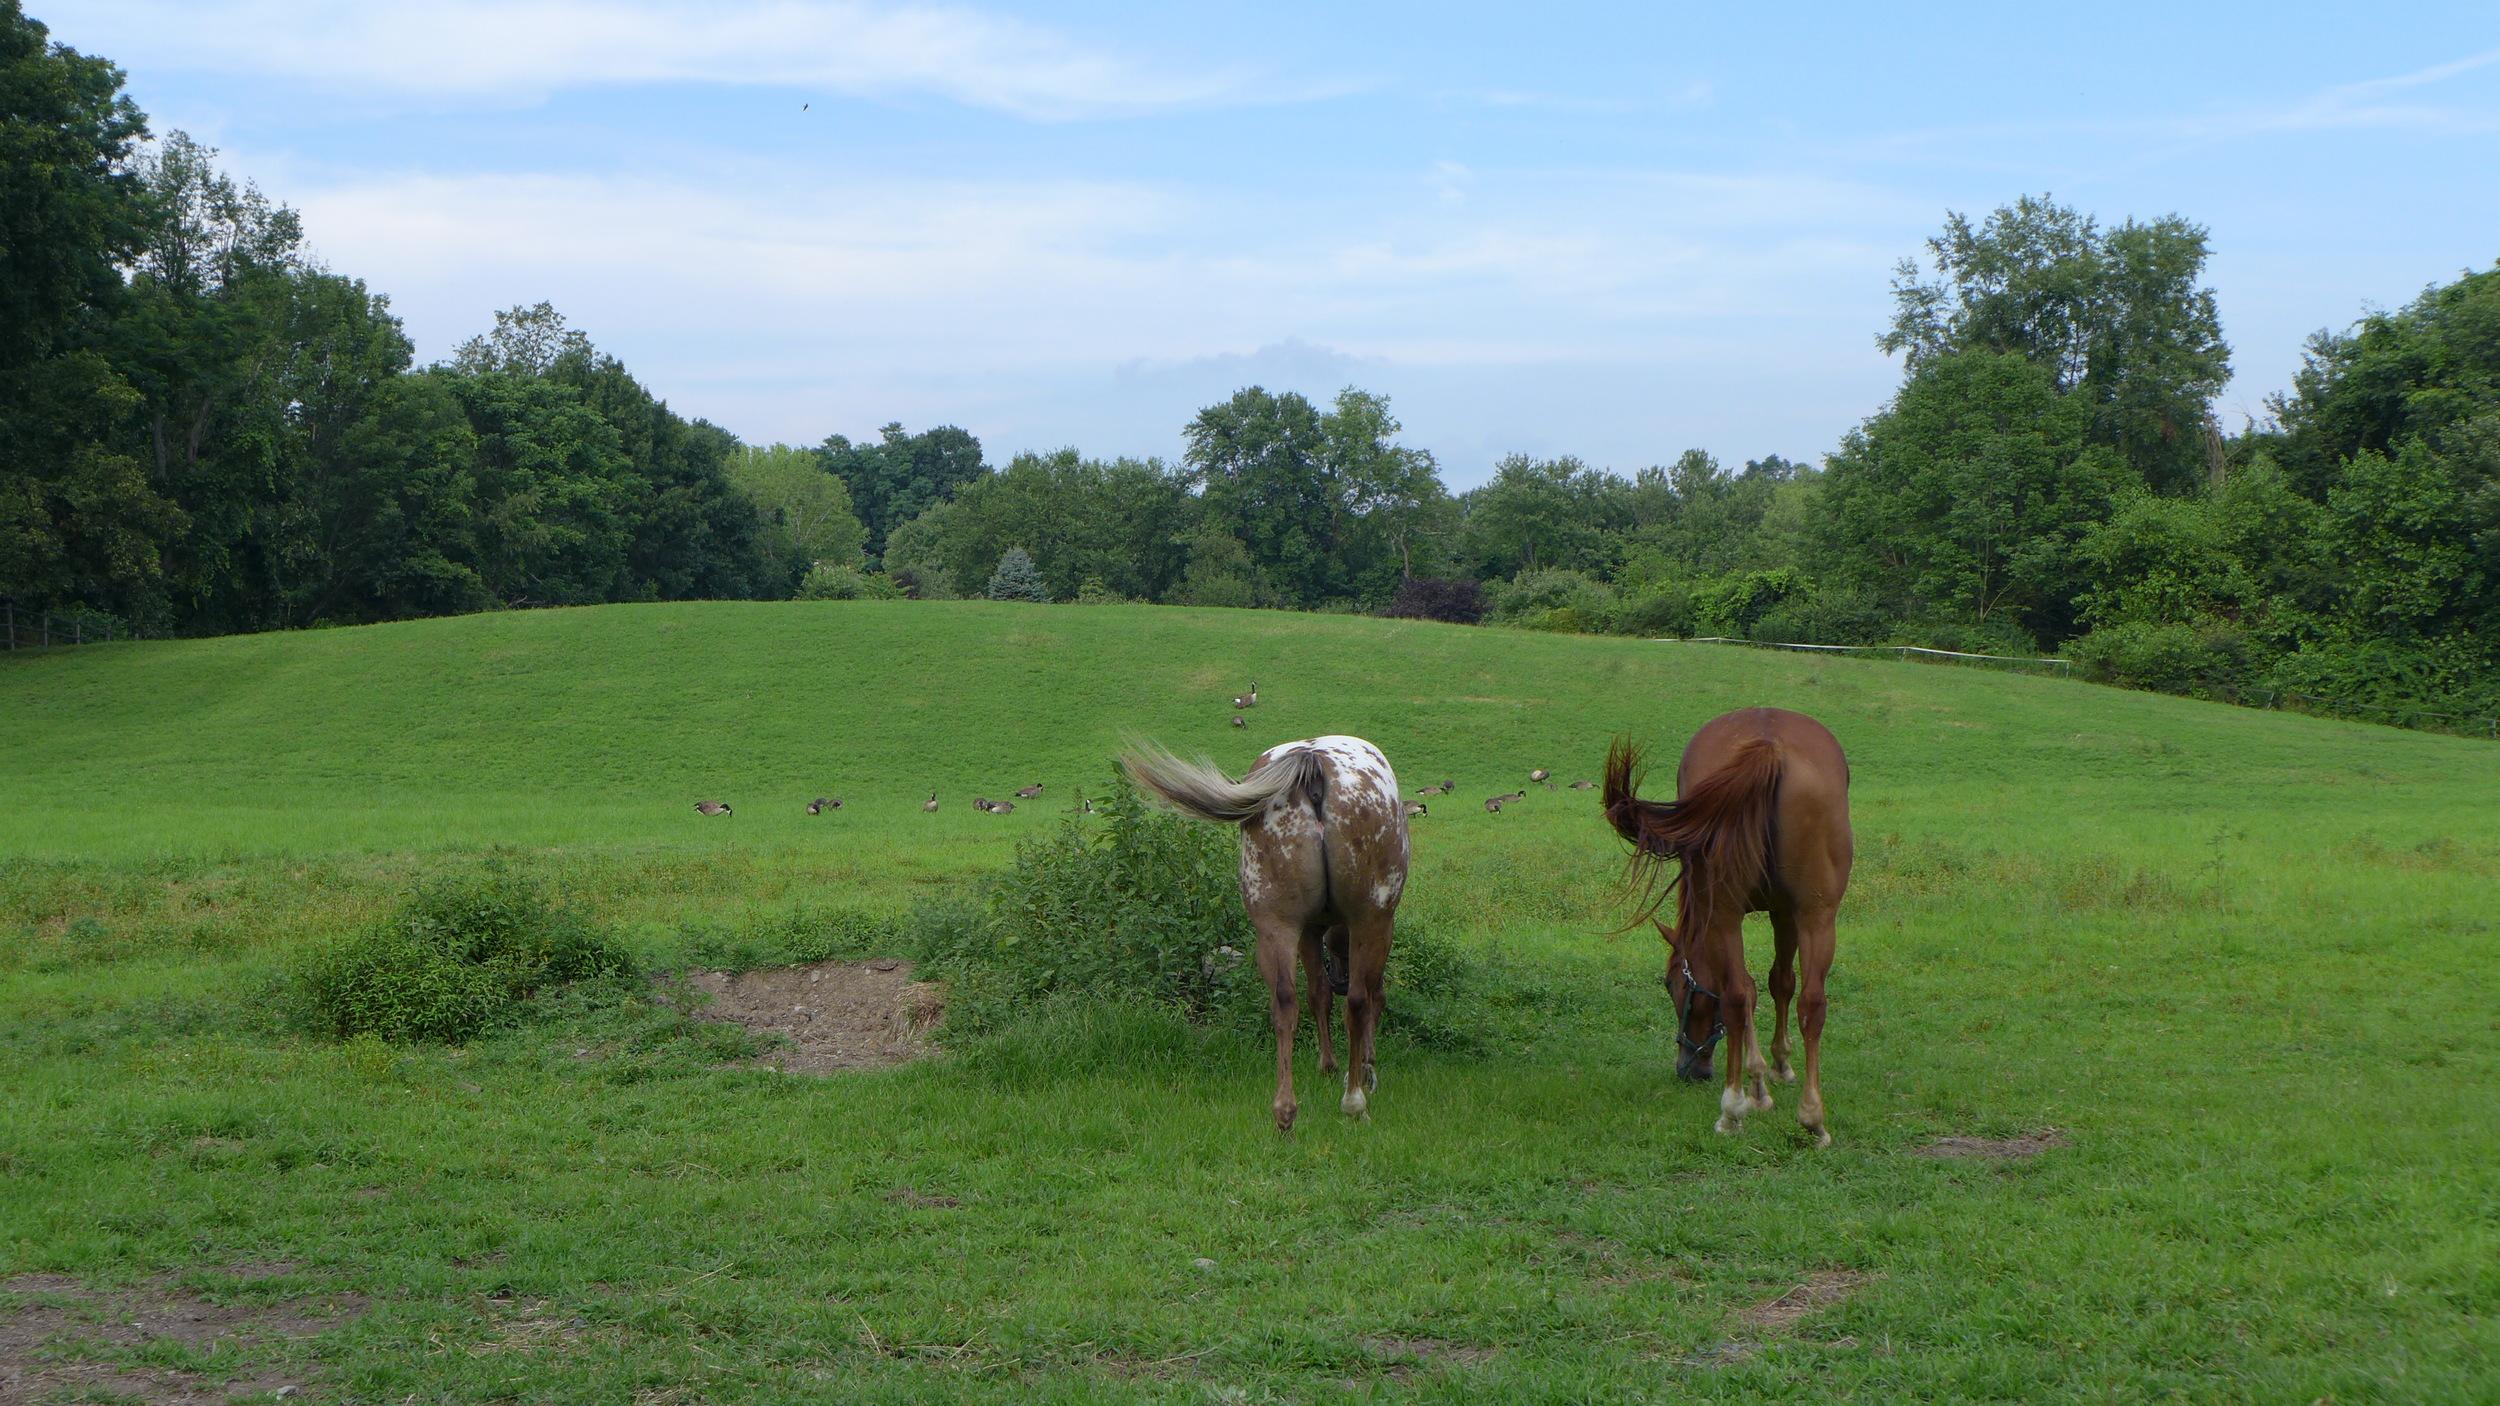 Horse Leasing New York Horseback Riding Misfit Farm